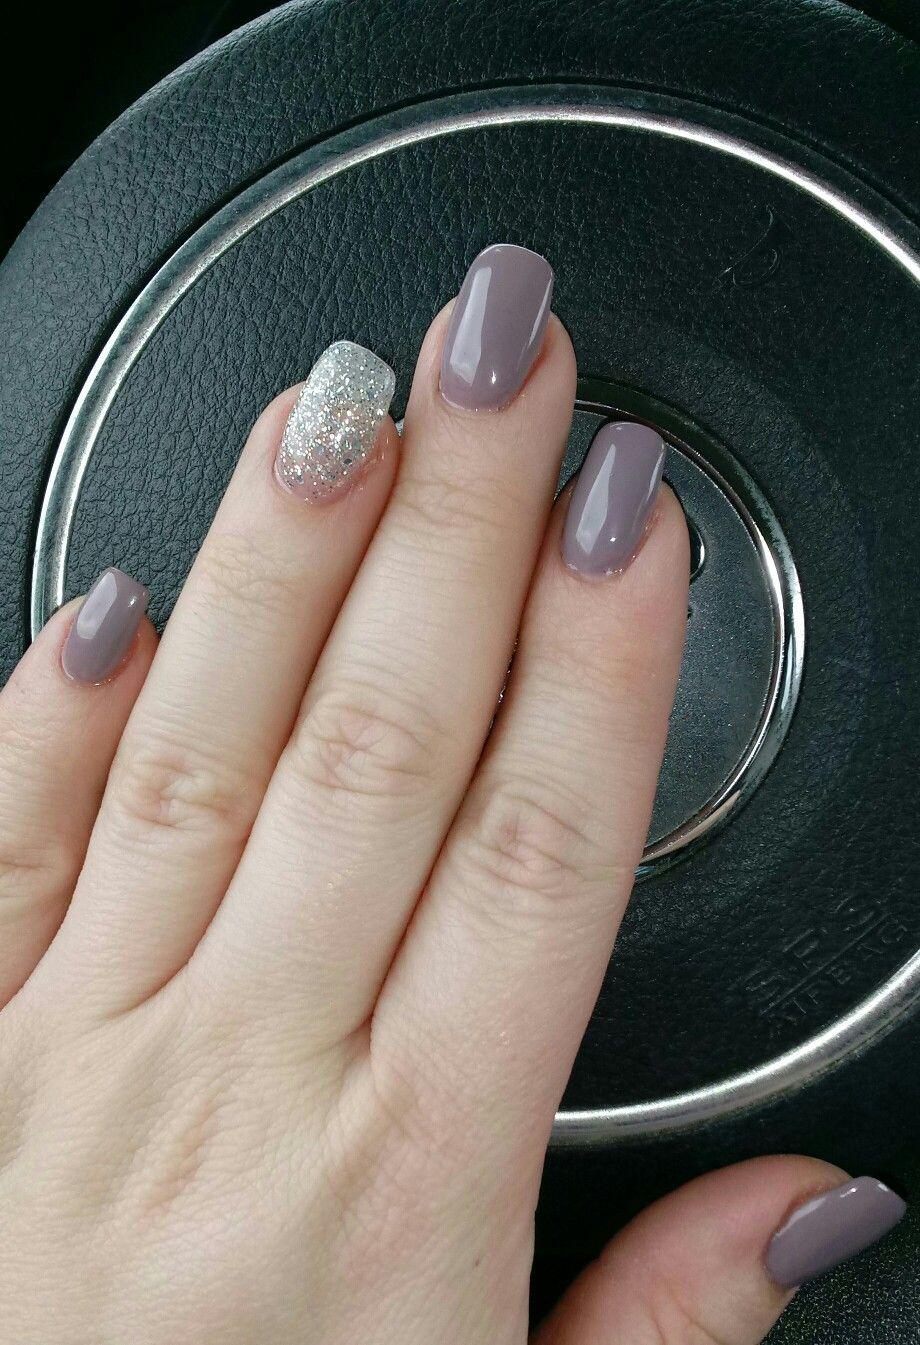 Melting Violet Dnd Sparkling Silver Dnd Gel Polish Gel Nail Polish Colors Cure Nails